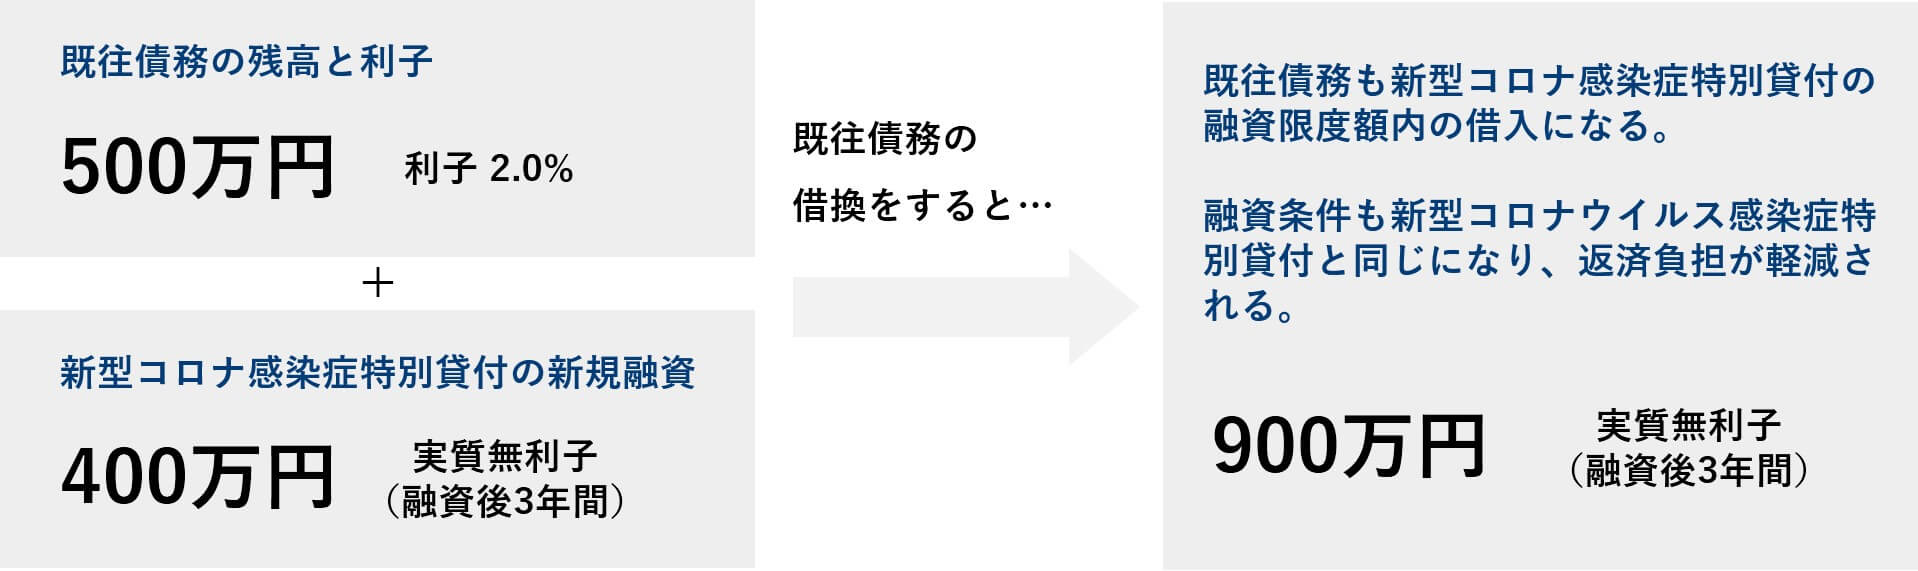 日本政策金融公庫の既往債務借換イメージ図